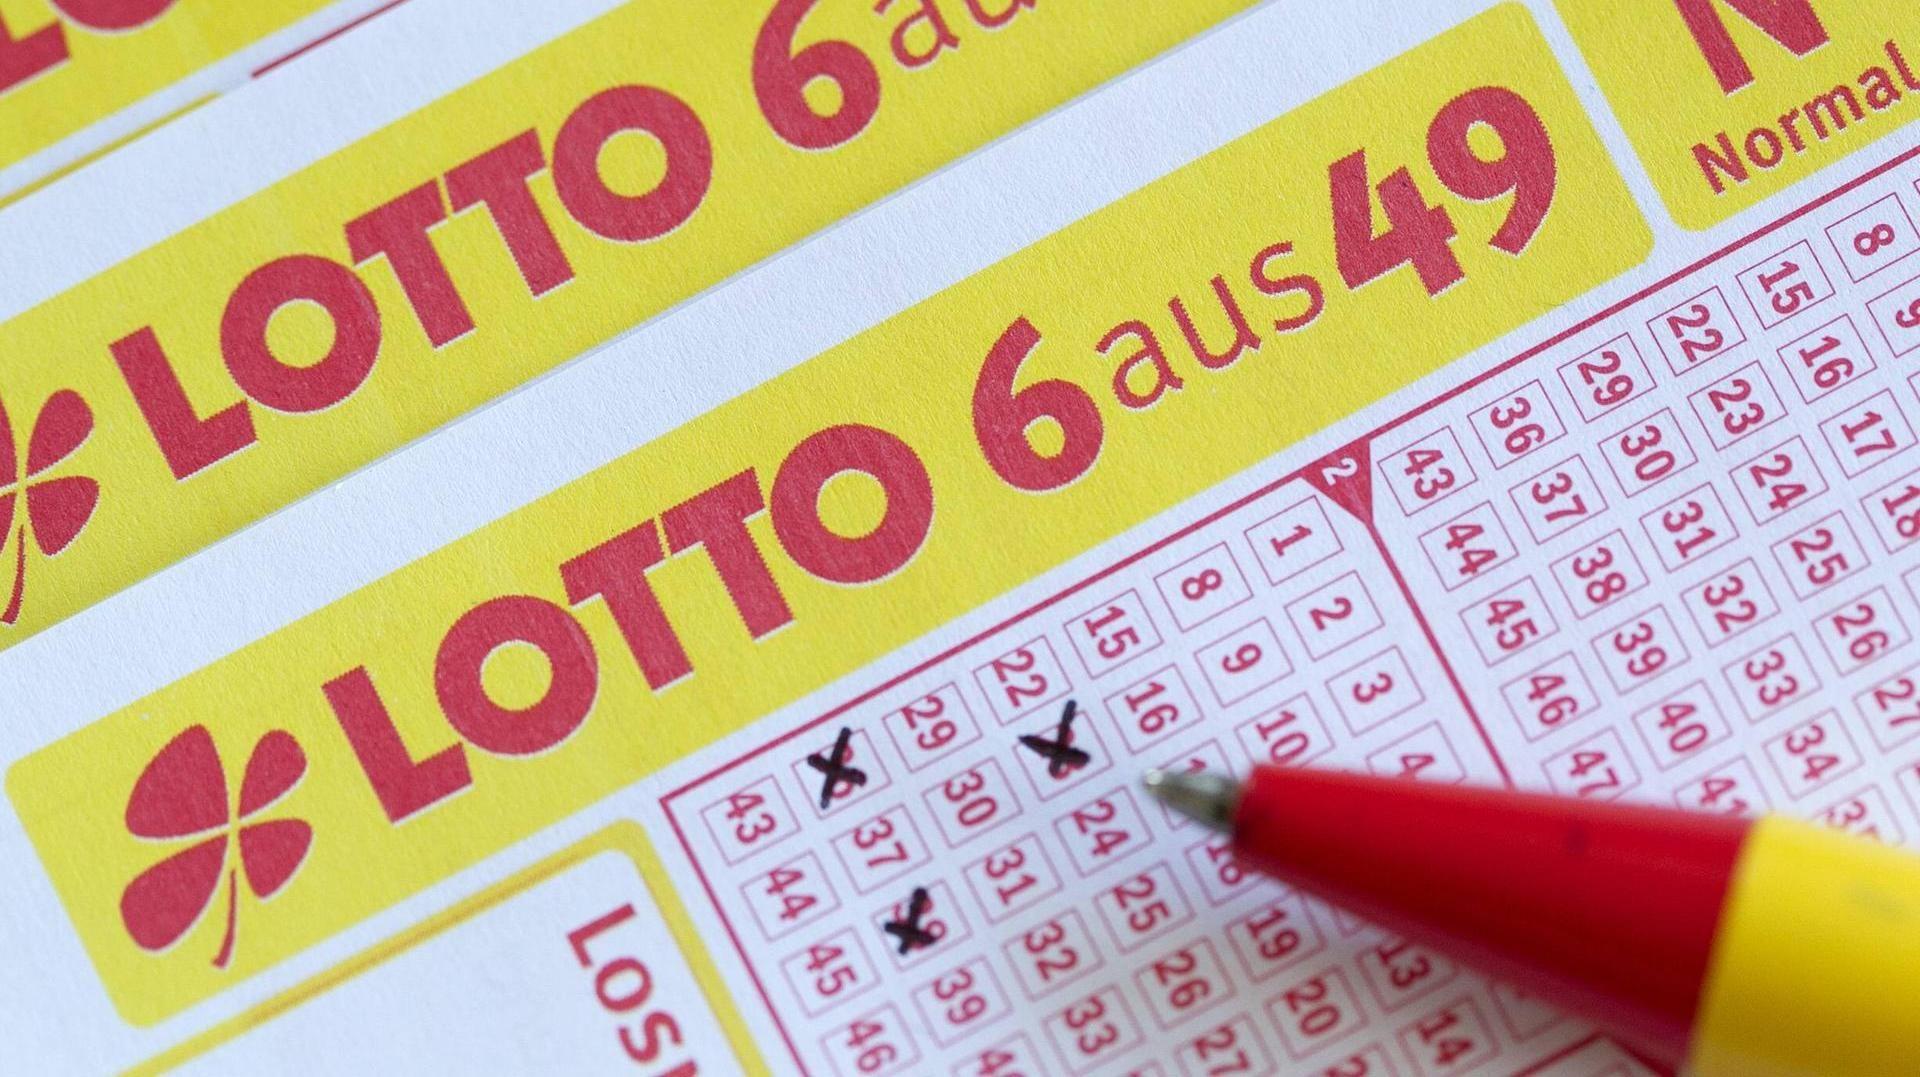 Zwei Millionen Euro Beim Lotto Am Samstag Mood Boards Projects